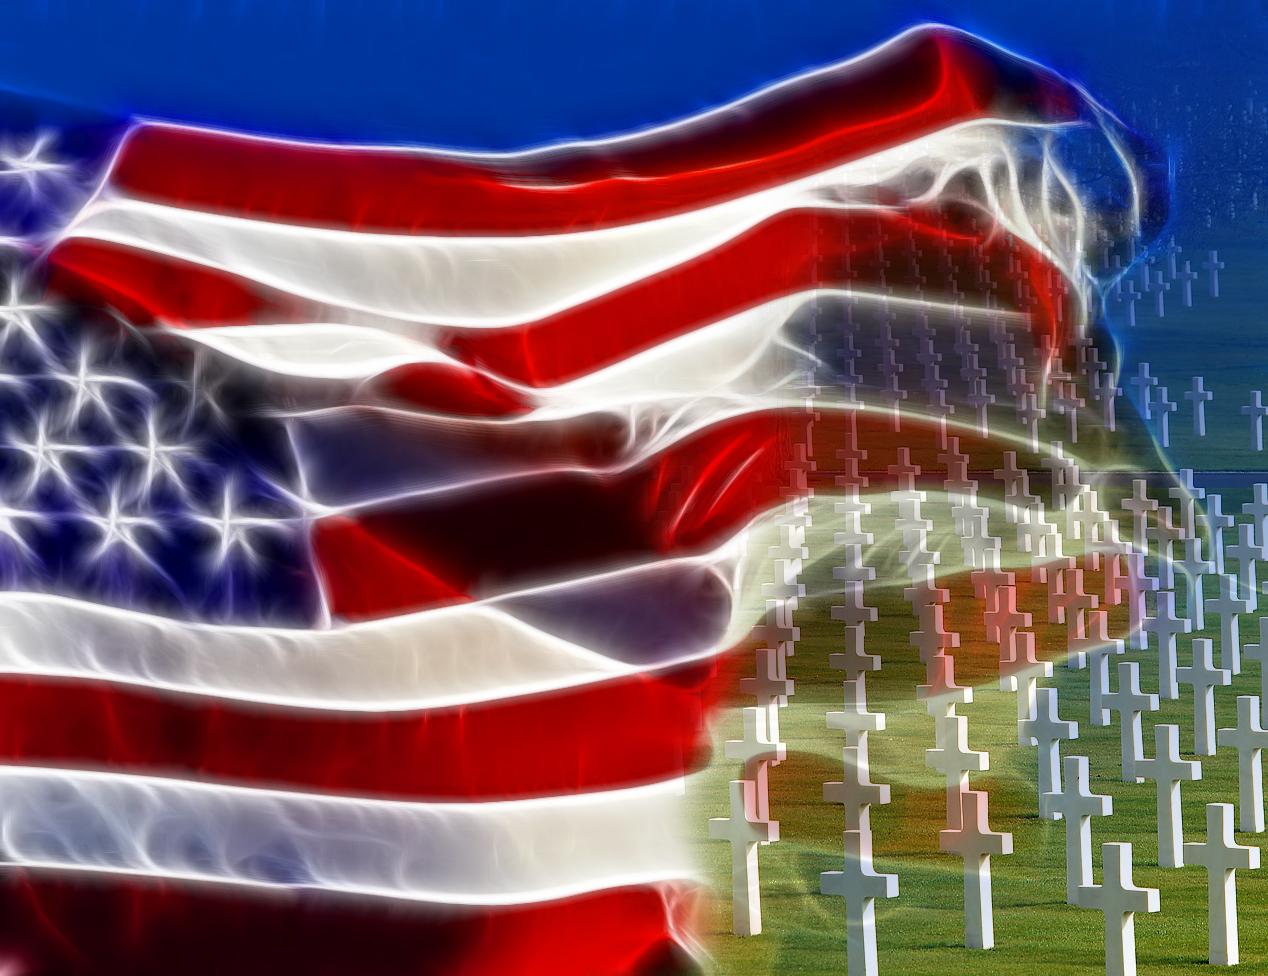 Patriotic wallpaper free impremedia memorial day free download patriotic picture a photo on flickriver voltagebd Choice Image